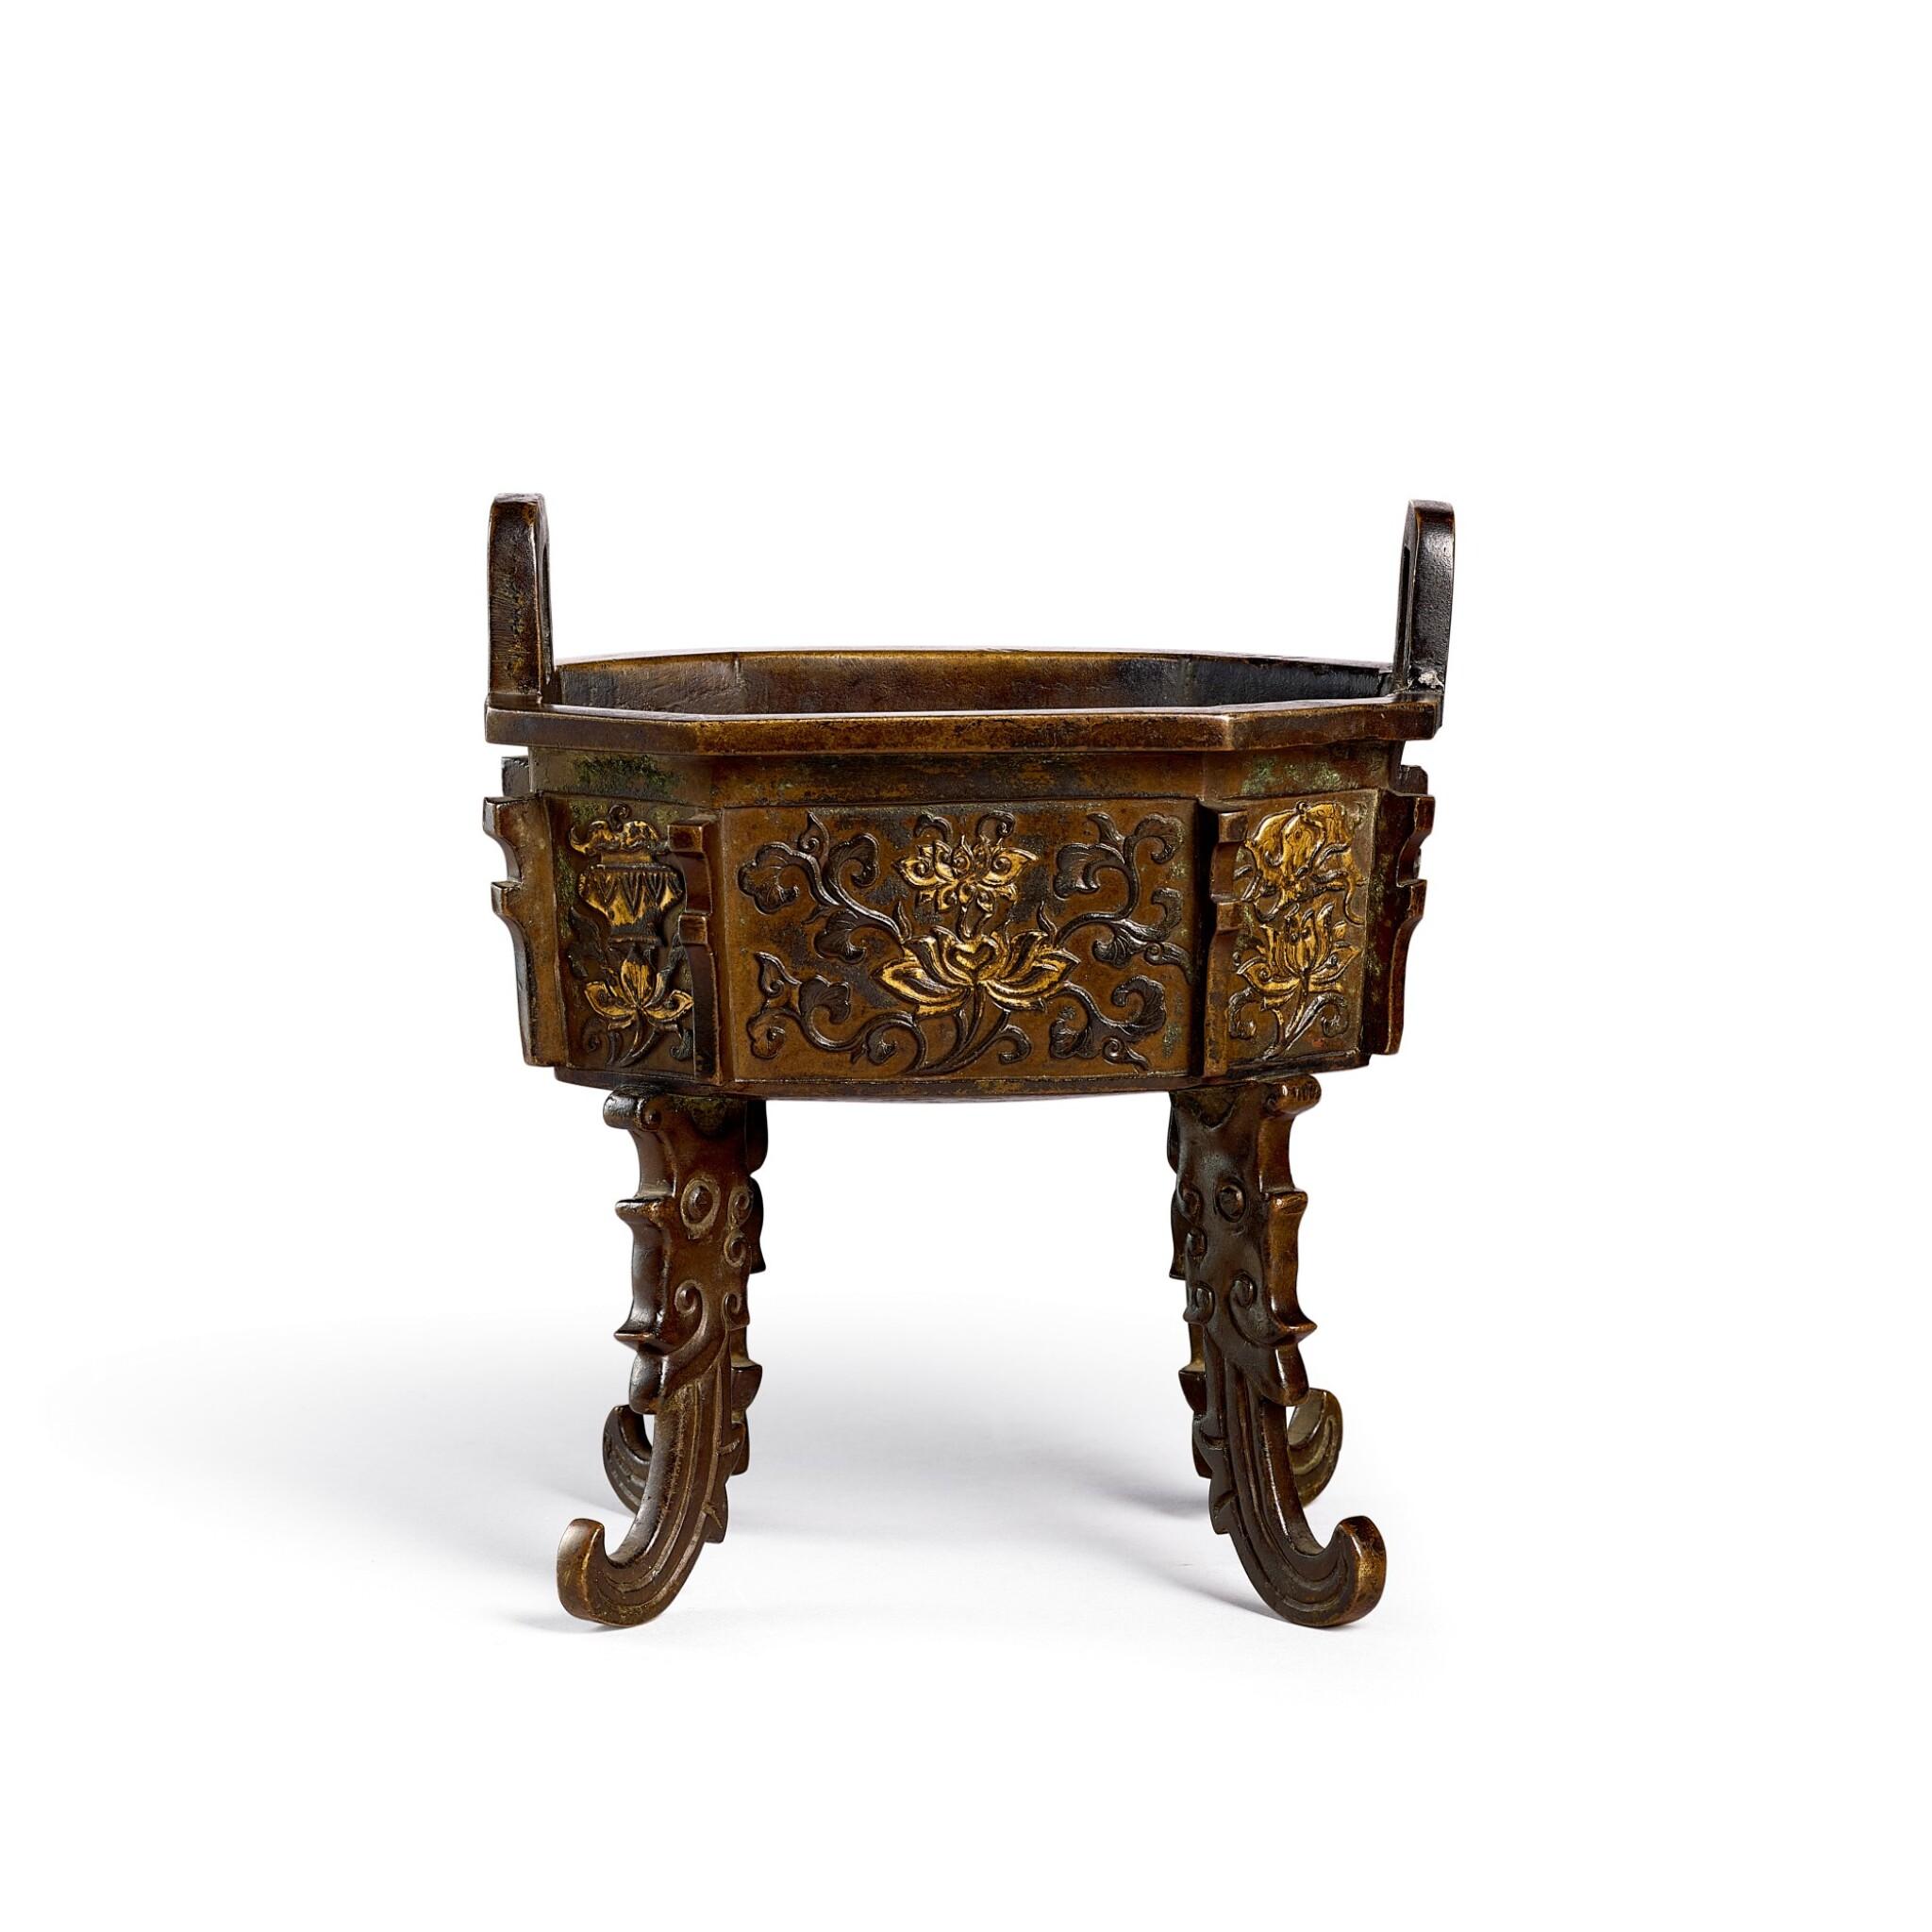 View full screen - View 1 of Lot 3676. A parcel-gilt bronze 'bajixiang' incense burner, ding Ming dynasty, Xuande mark   明 局部鎏金銅八吉祥衝天耳鼎式爐 《大明宣德年製》仿款.